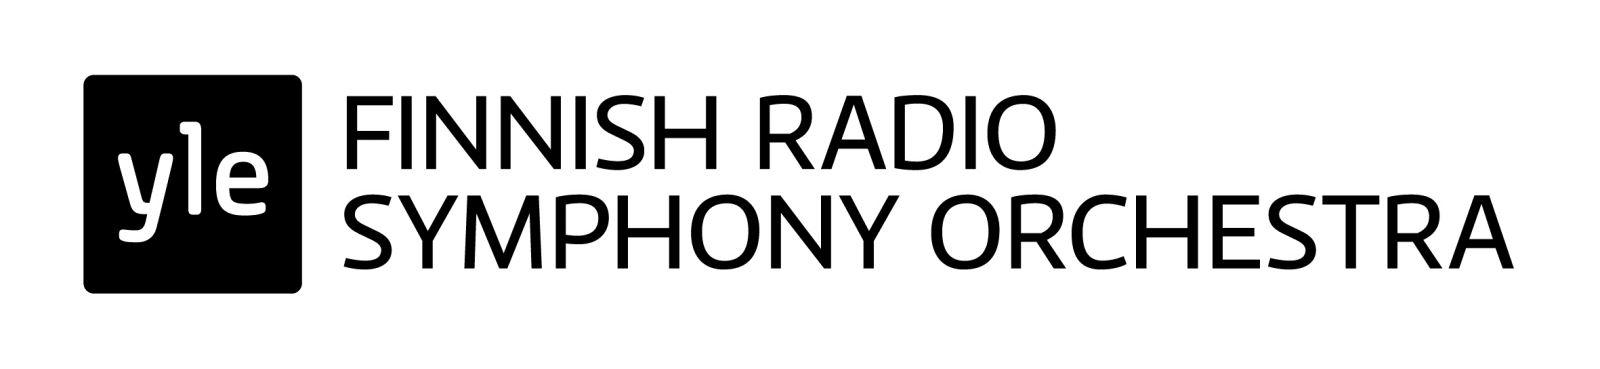 YleFinnishRadioSymphonyOrc_2012